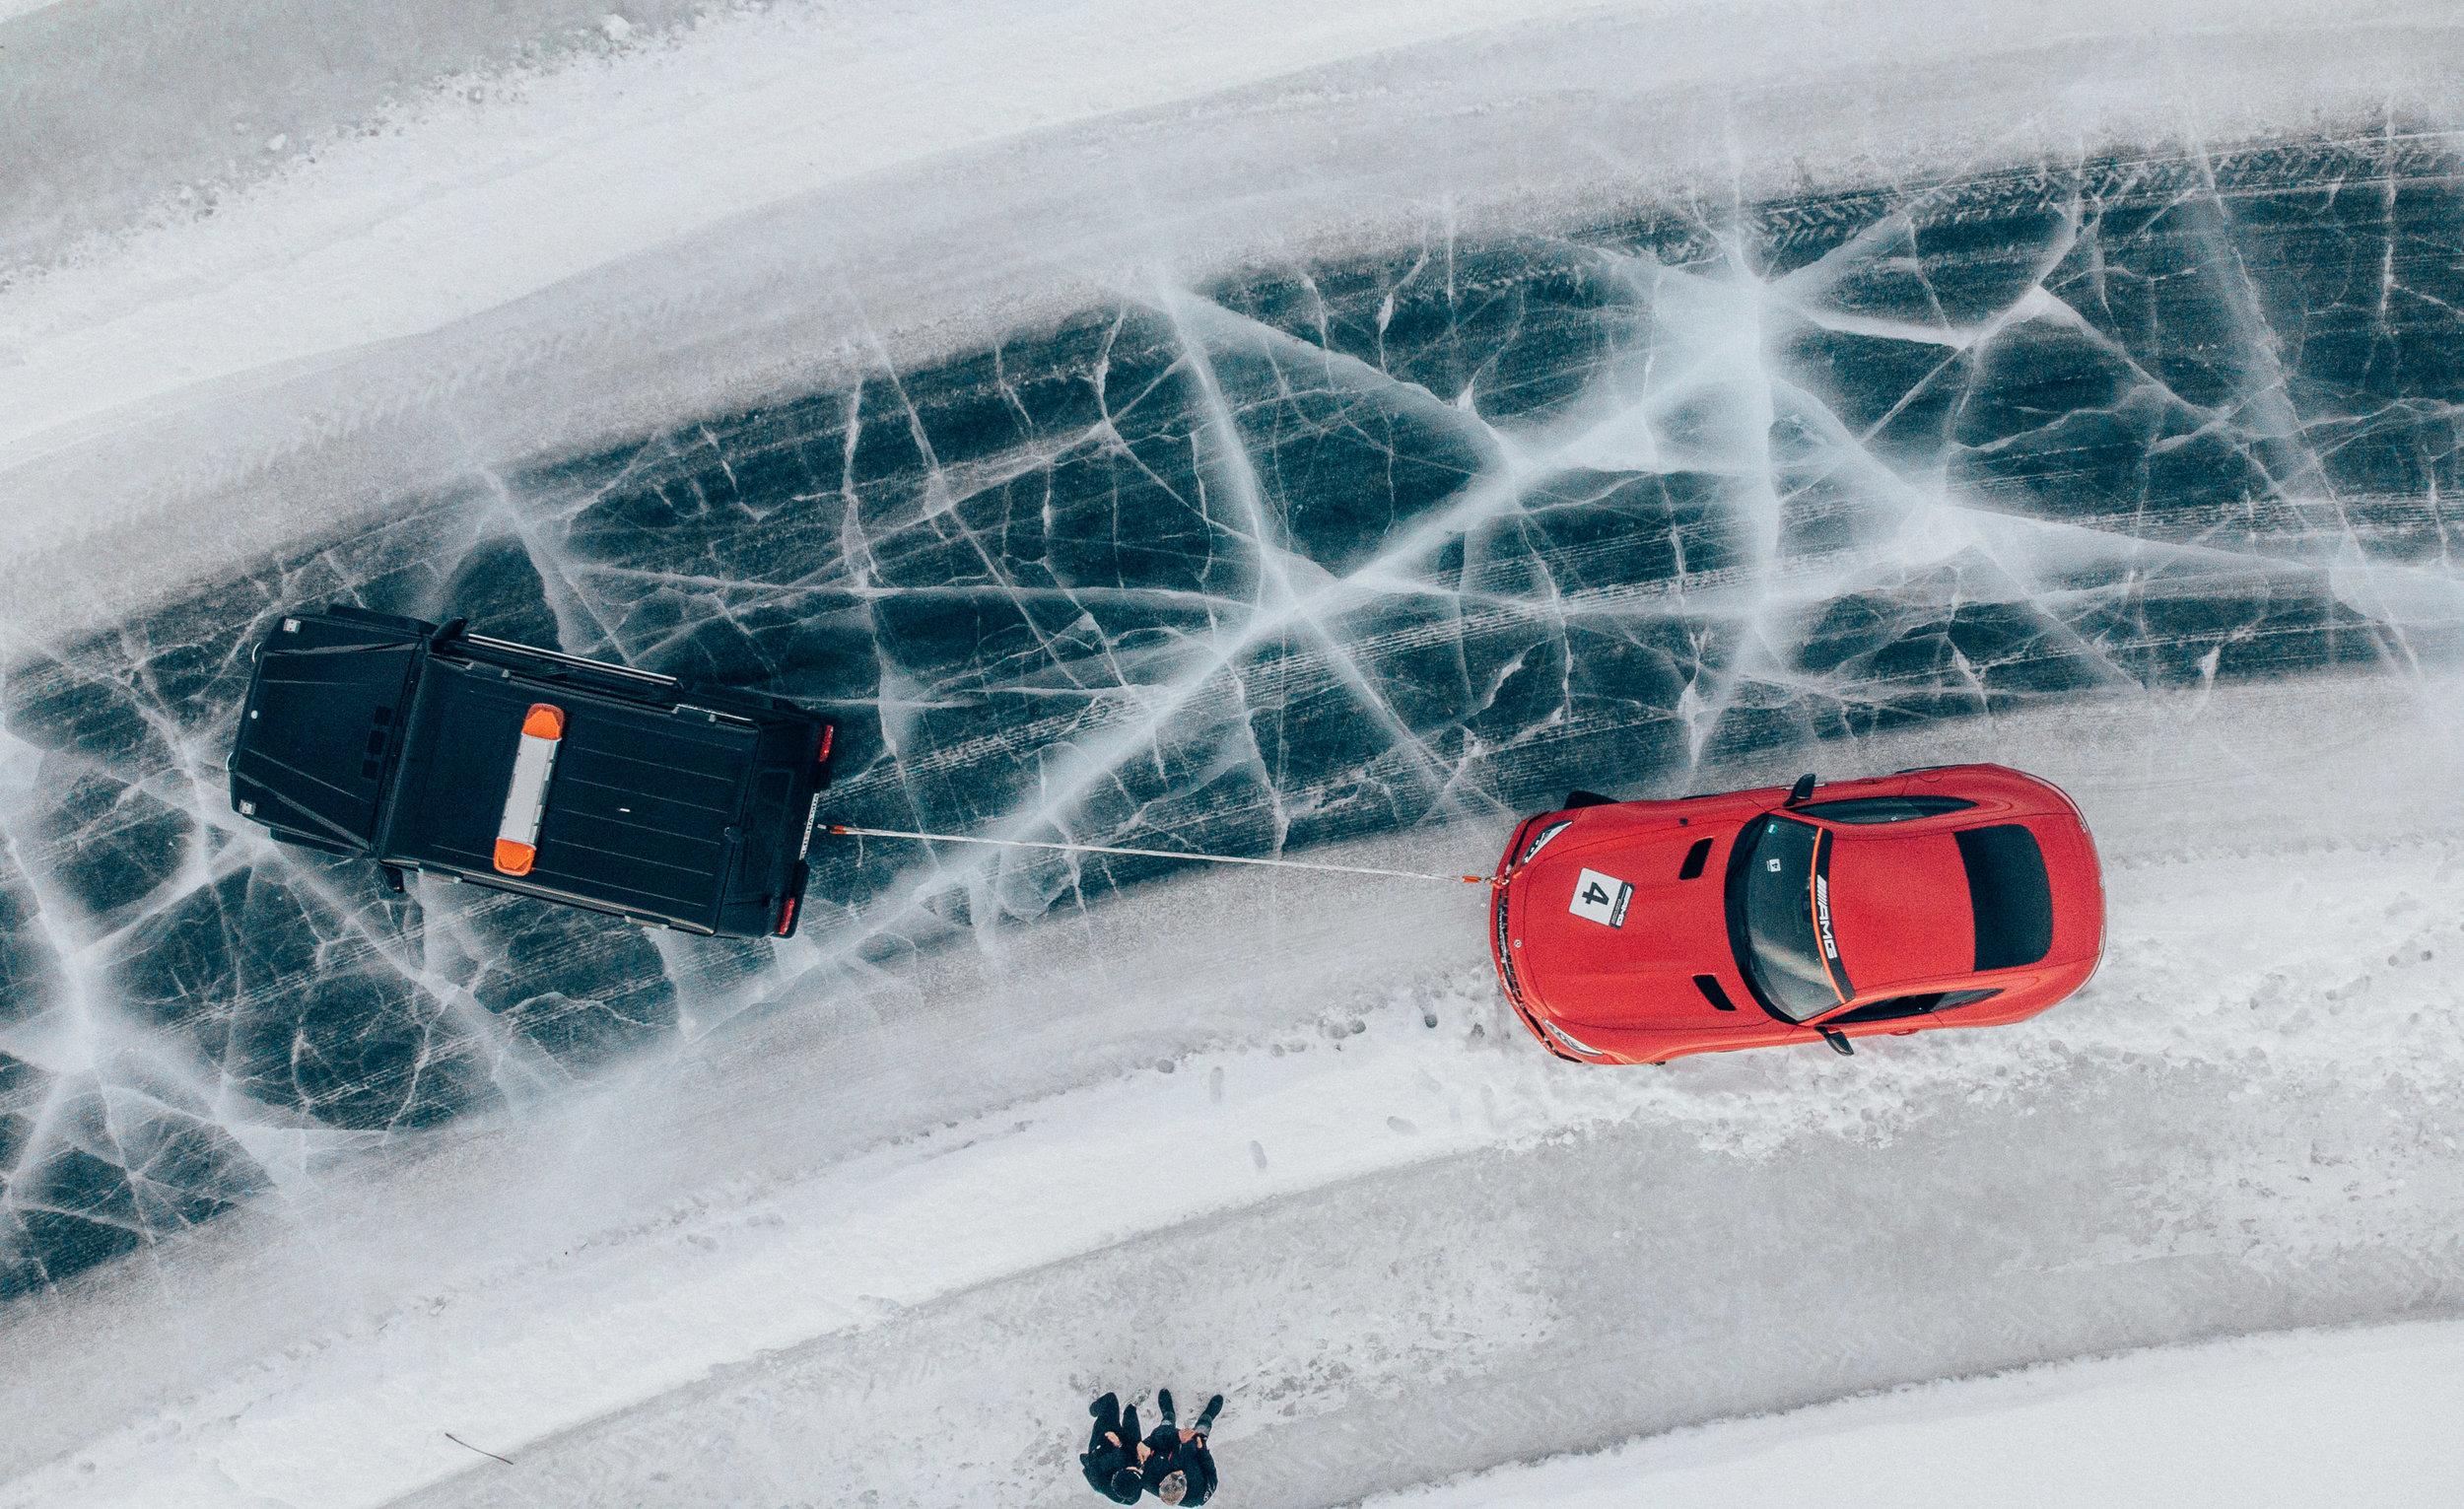 Drive_for_Good_Ice_Drive_by_Maxim_Kuijper-0553.jpg